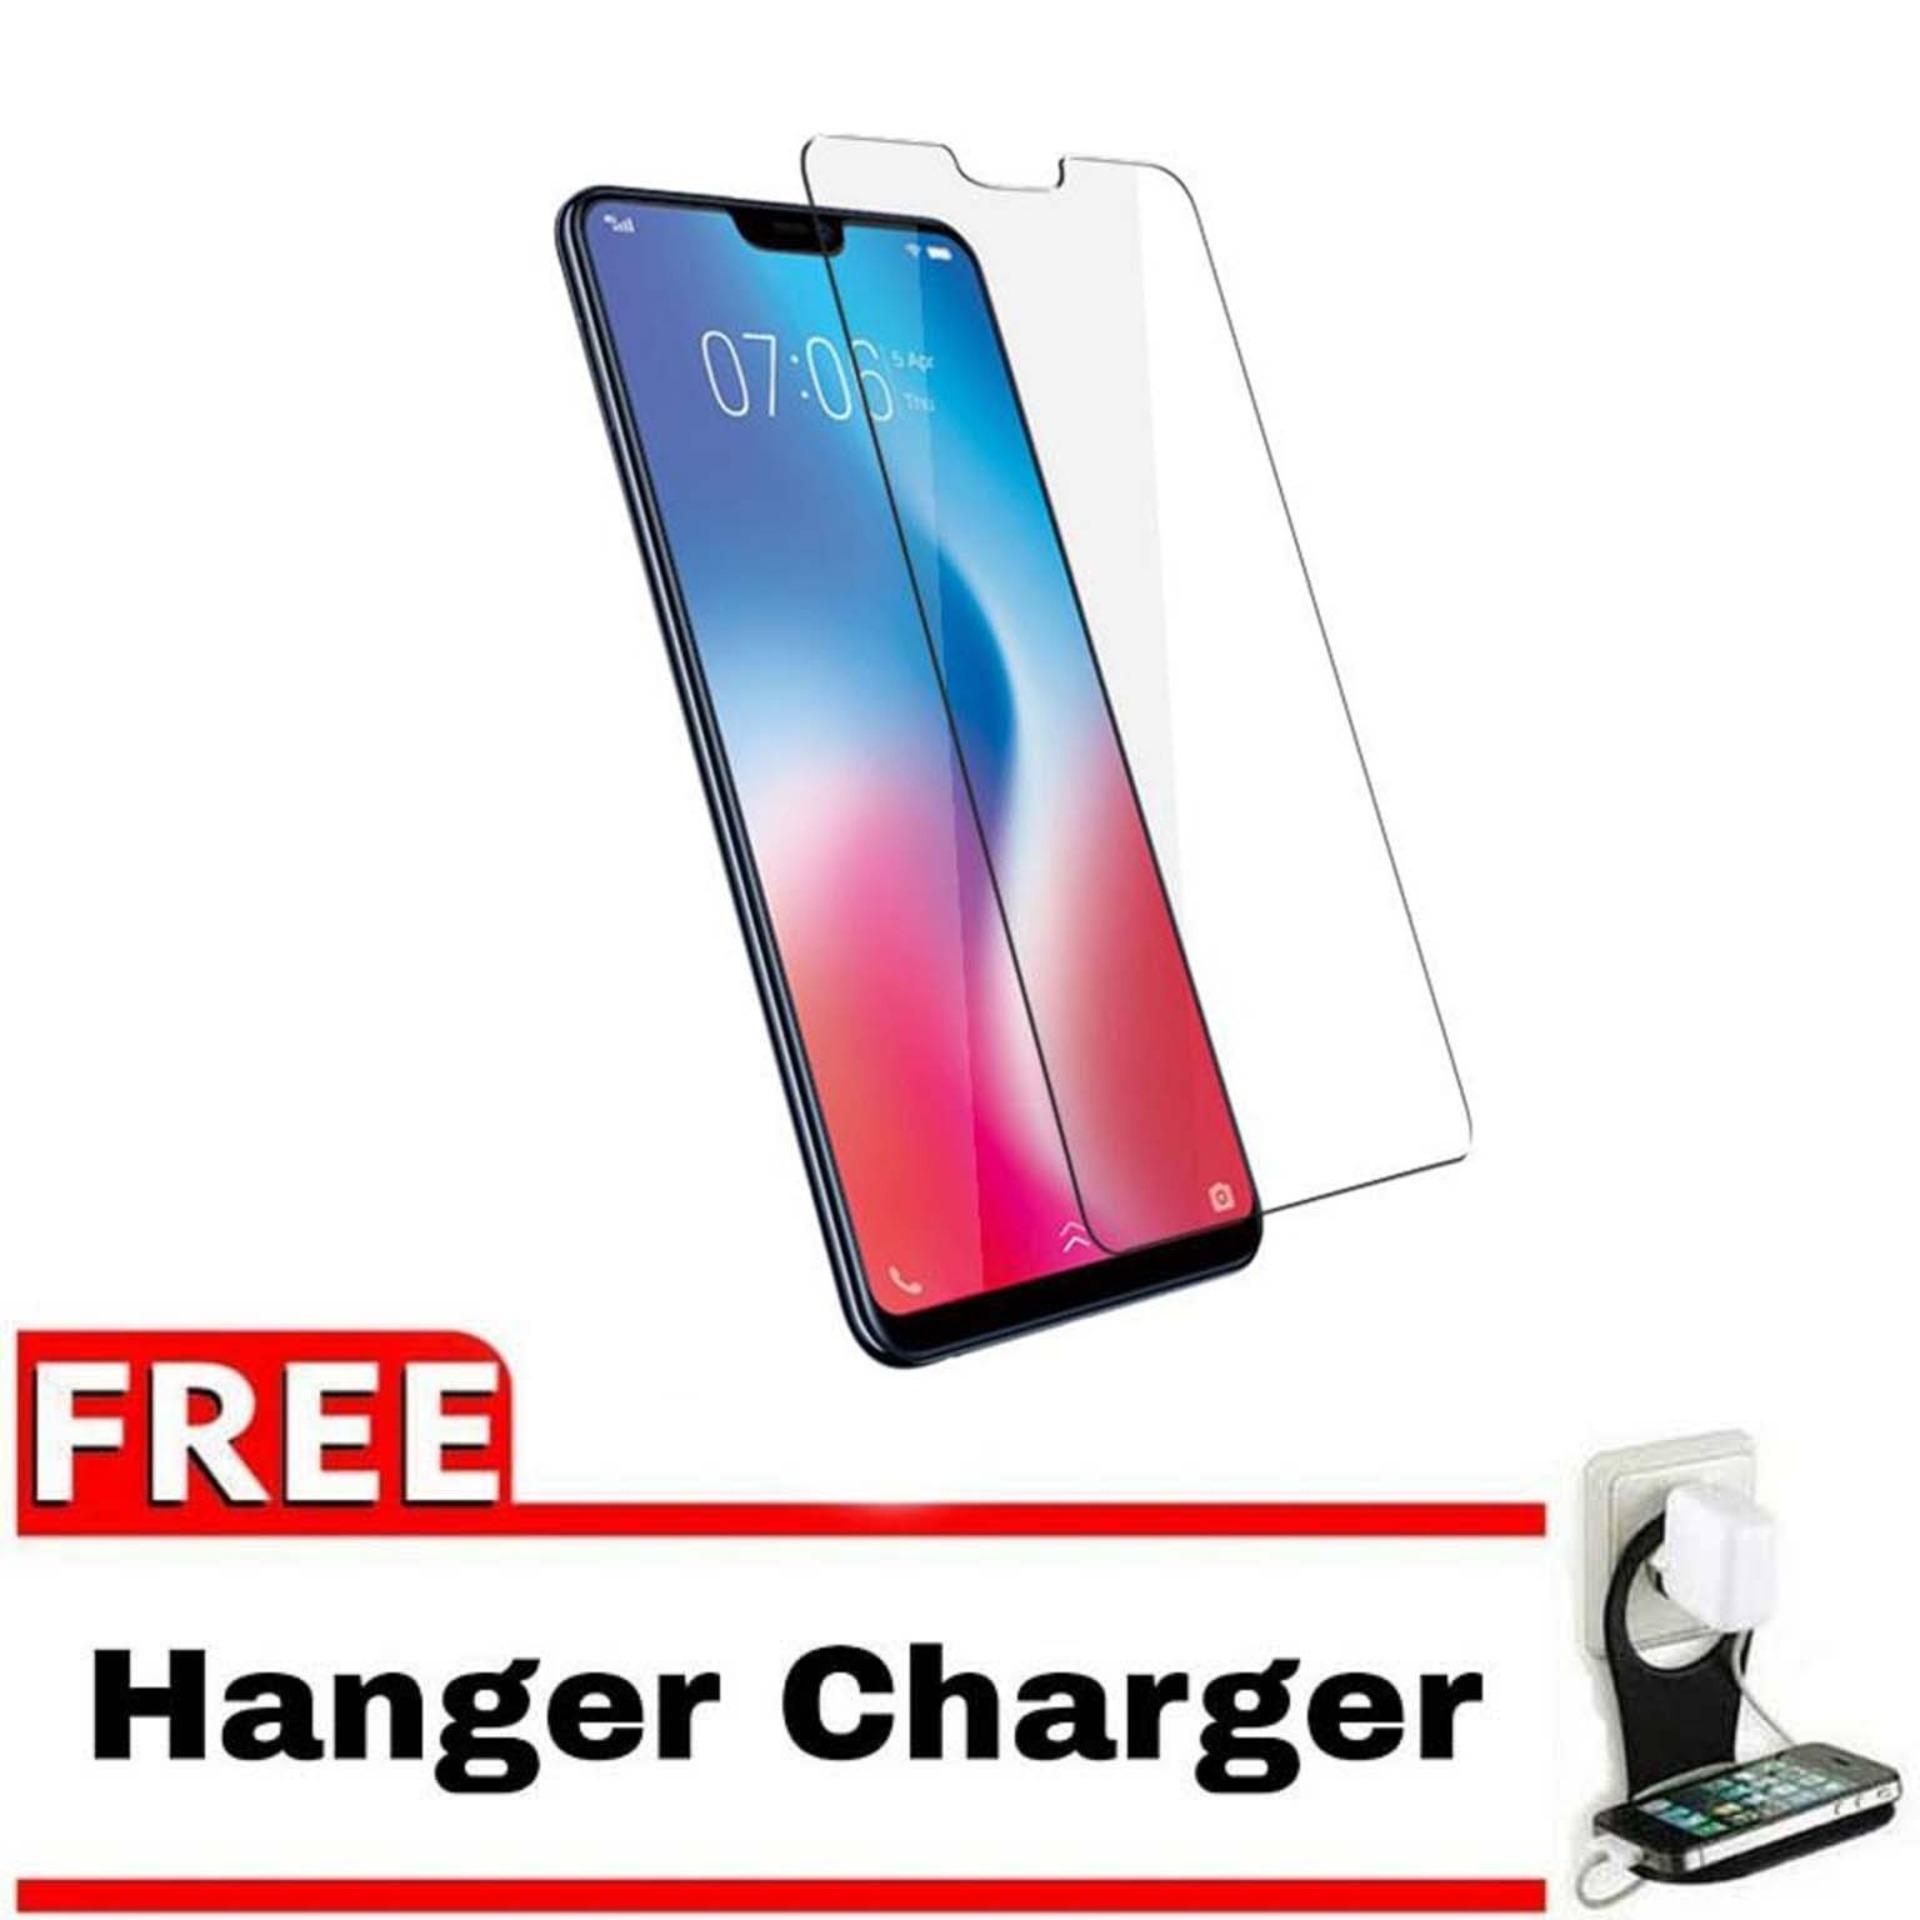 Vn Vivo V9 Tempered Glass 9H Screen Protector 0.32mm + Gratis Free Hanger Charger Smartphone